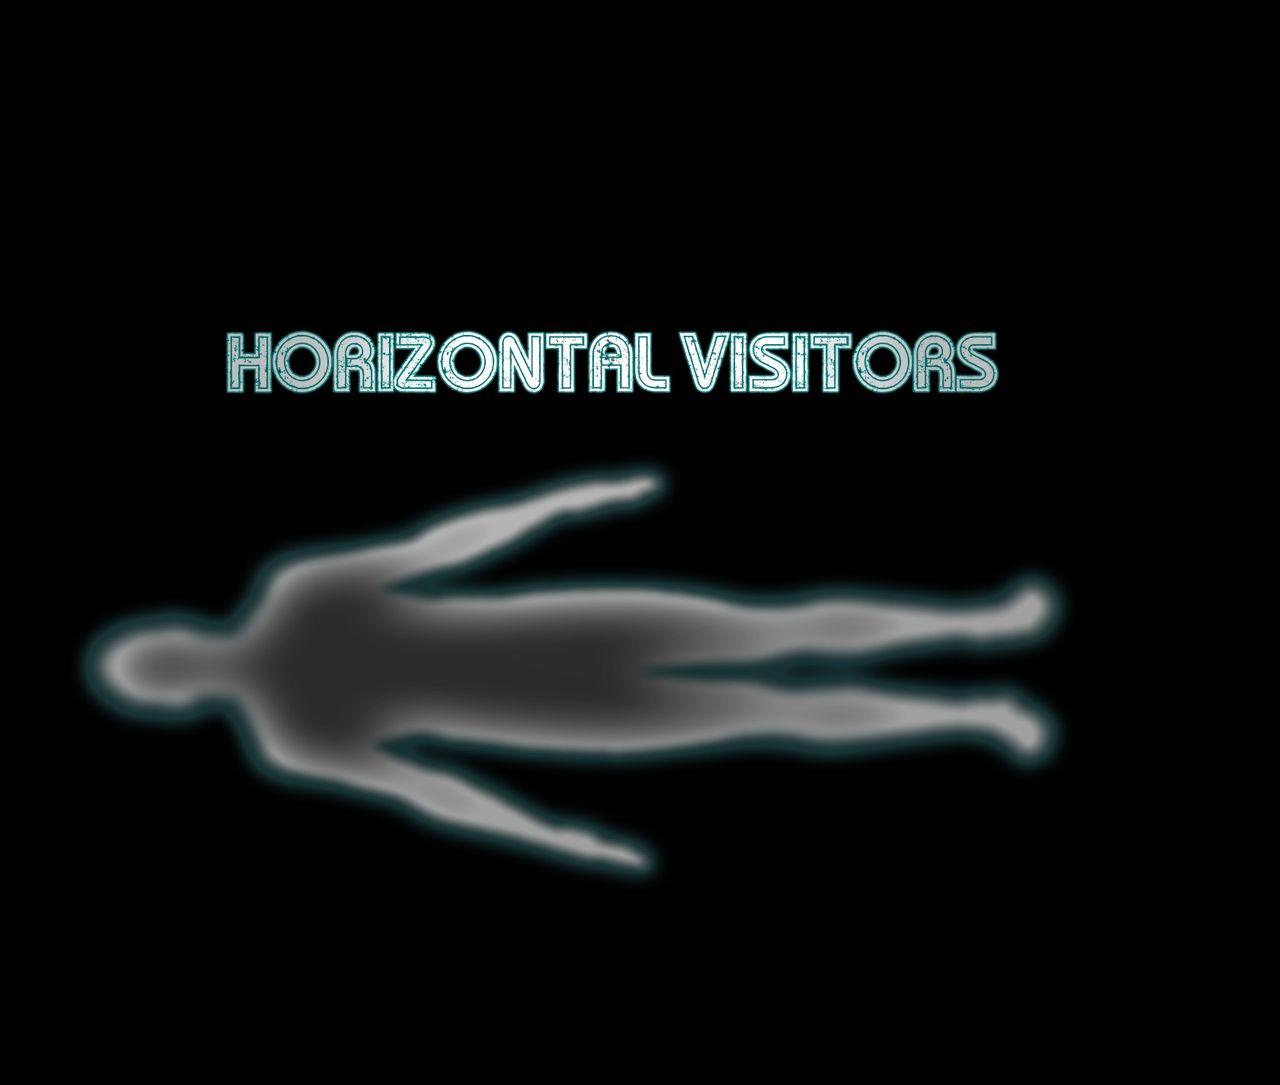 91_horizontal_visitors.jpg